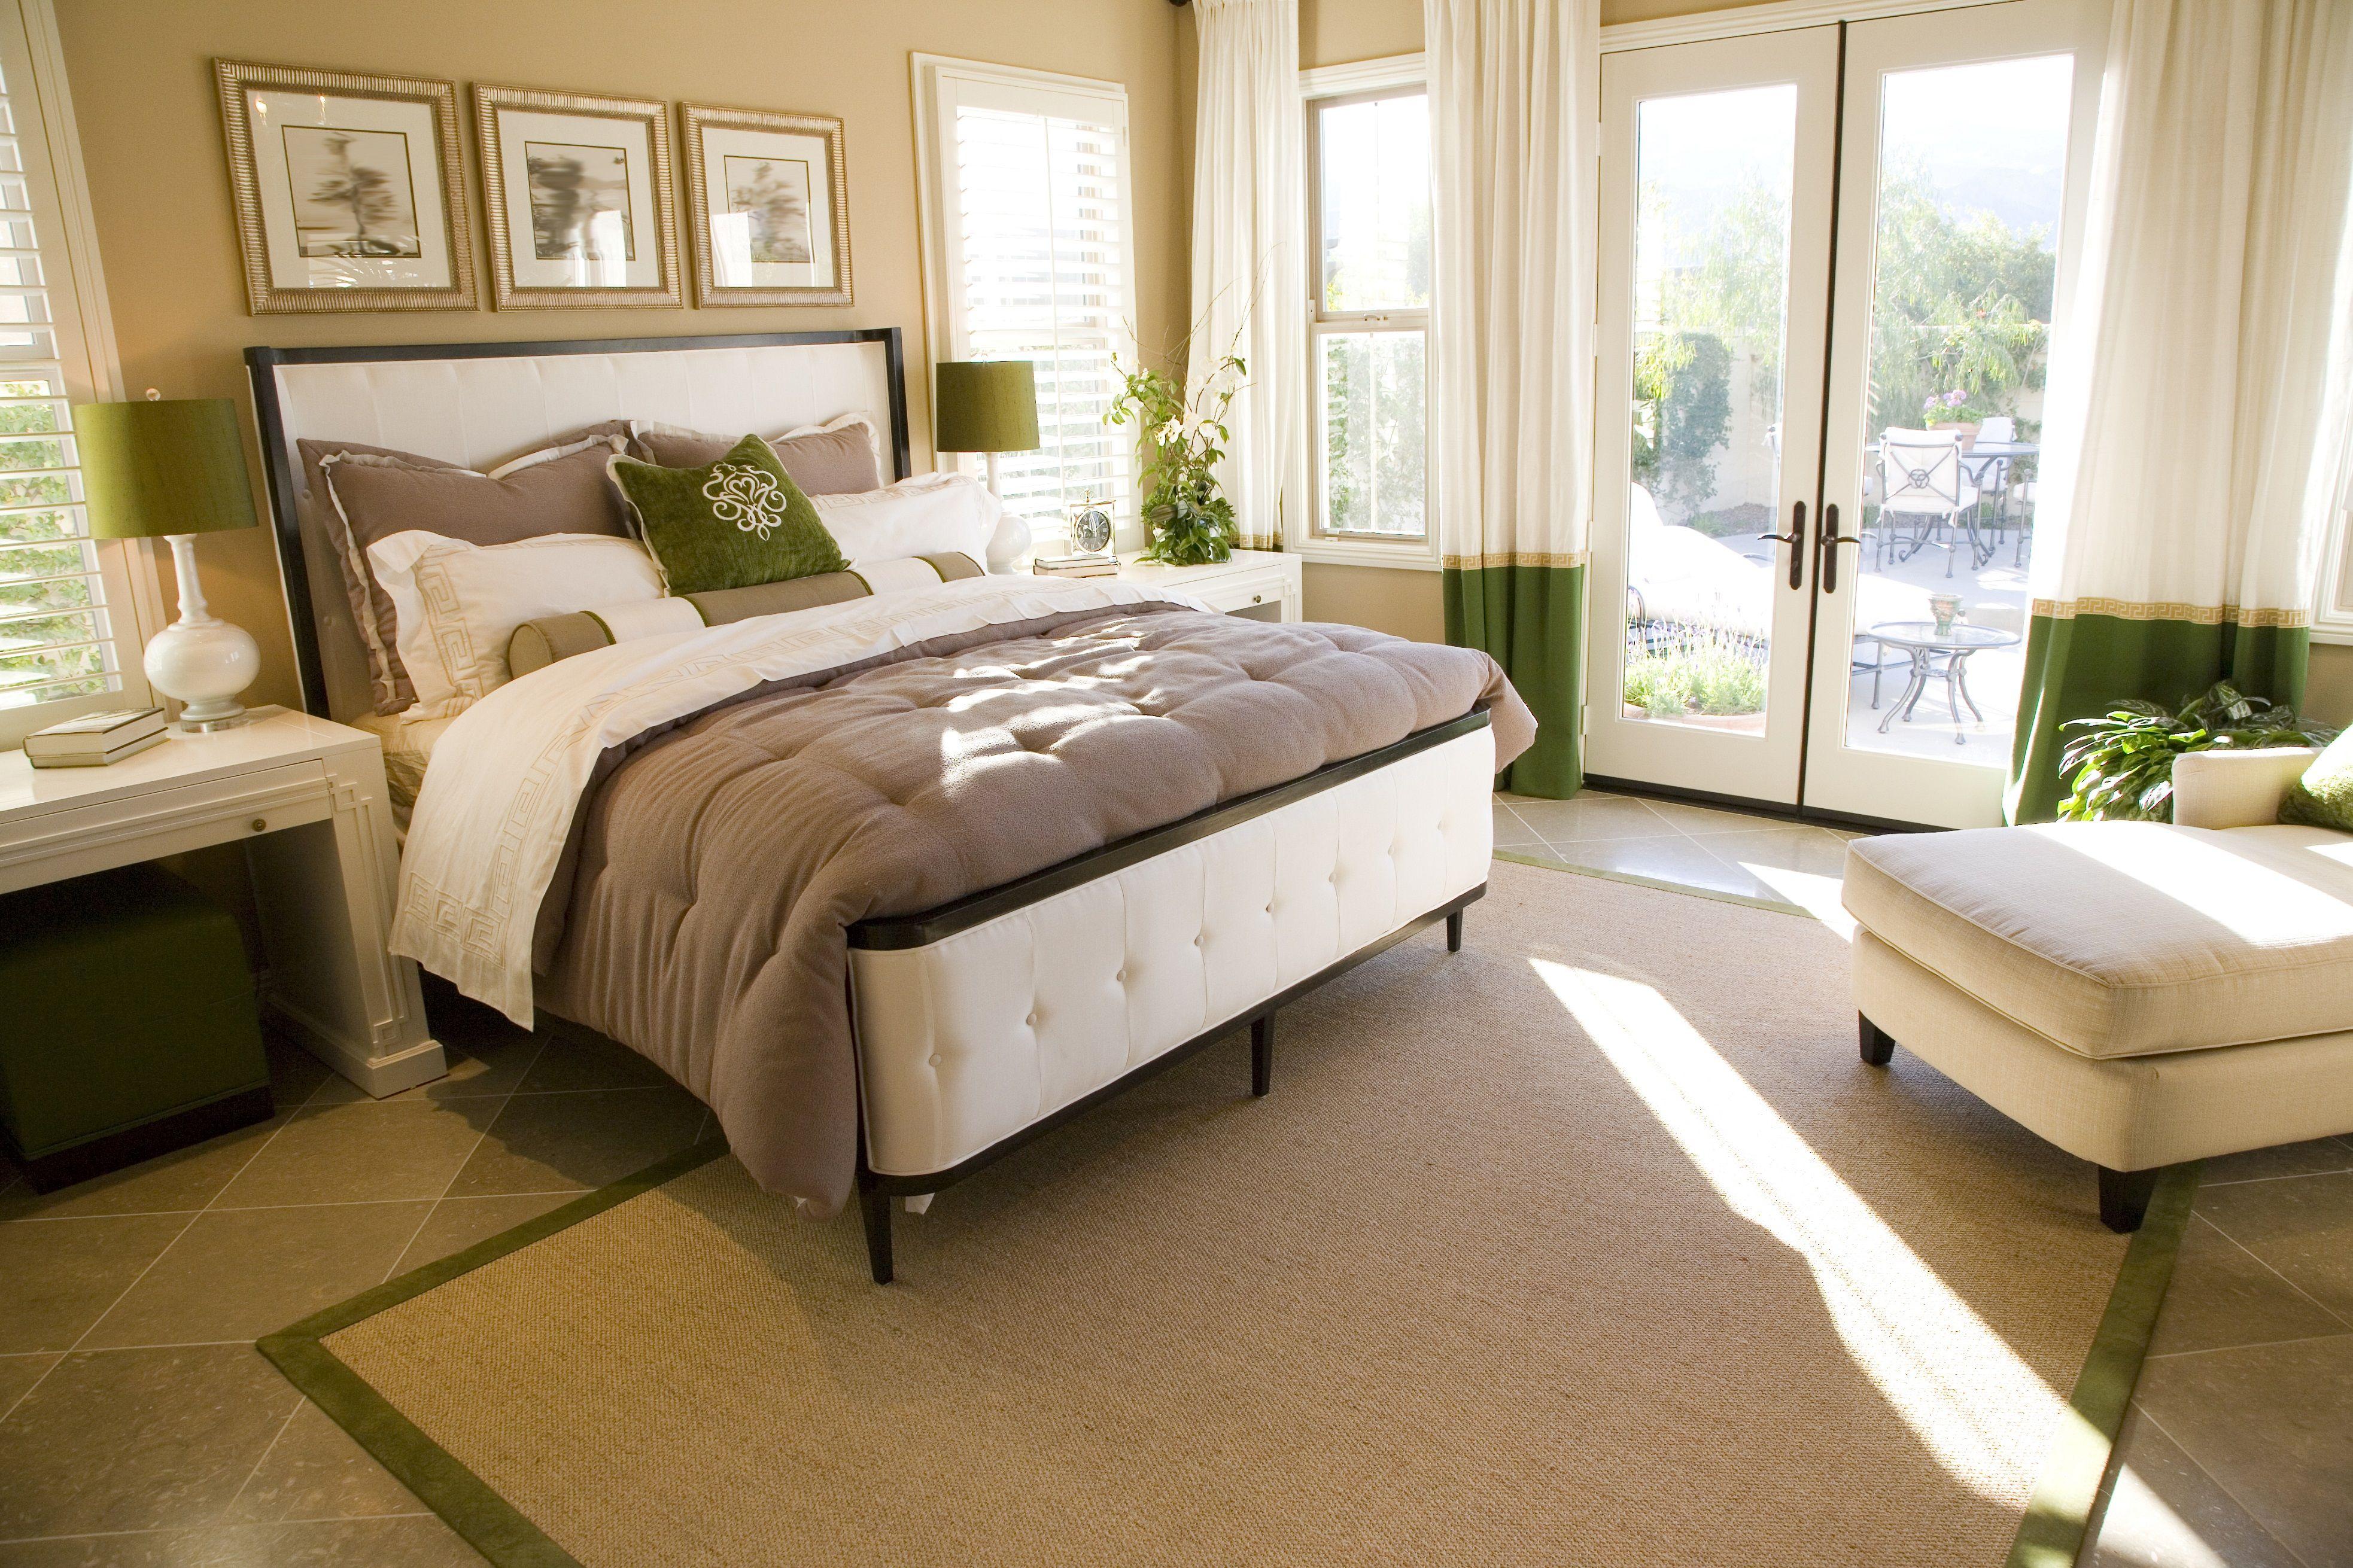 Charming Guest Bedroom Ideas Luxury Bedroom Master Luxury Master Bedroom Design Master Bedrooms Decor